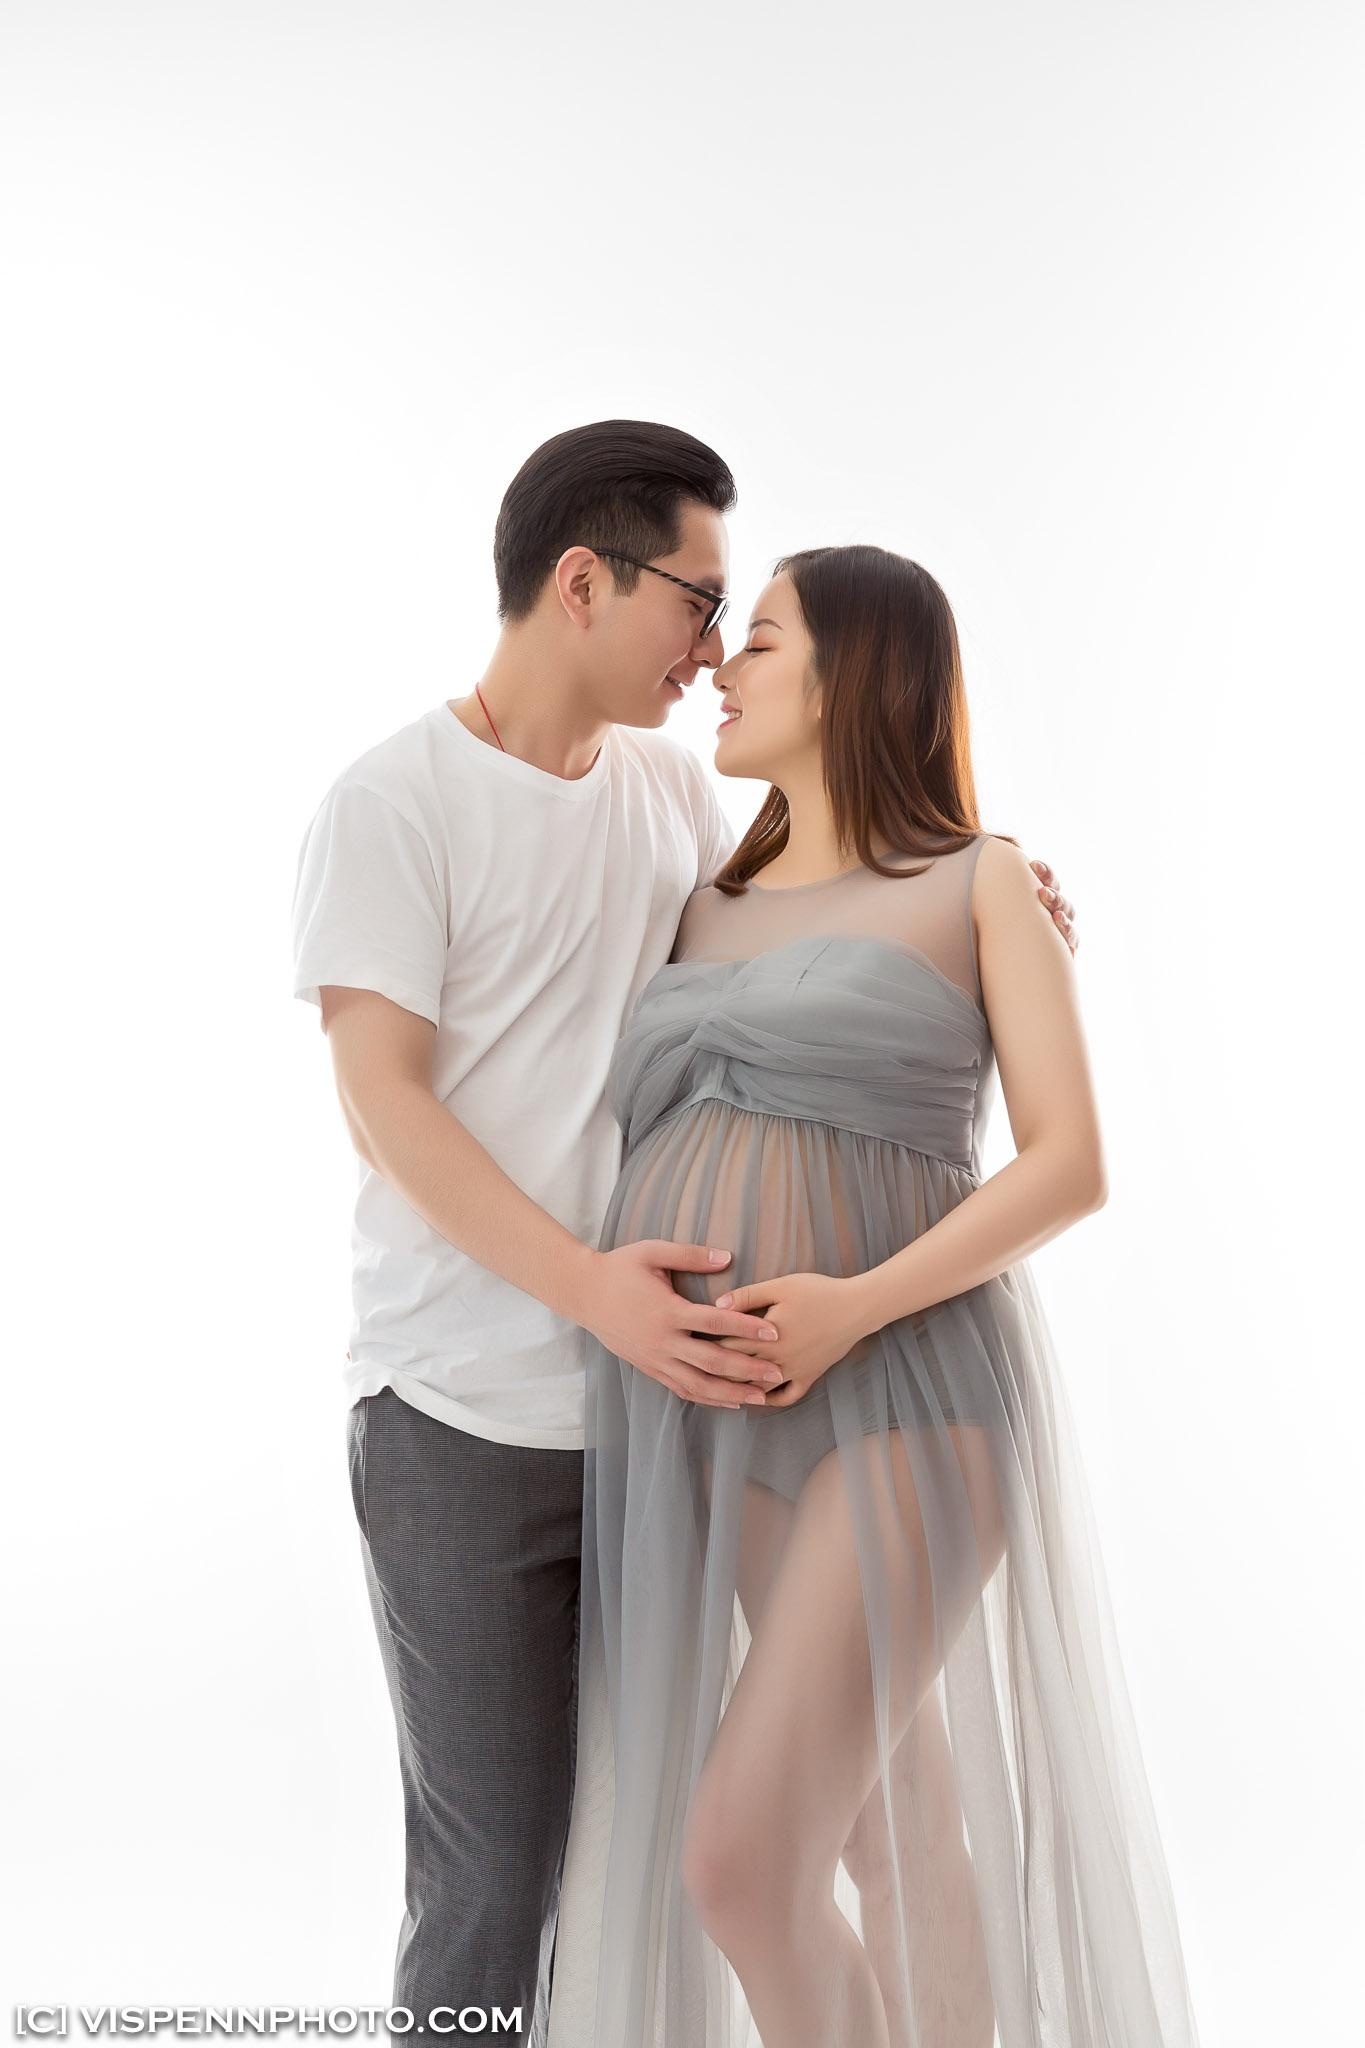 Melbourne Newborn Baby Maternity Family Photo VISPENN 墨尔本 孕妇照 大肚照 VISPENN MichelleXu 0553